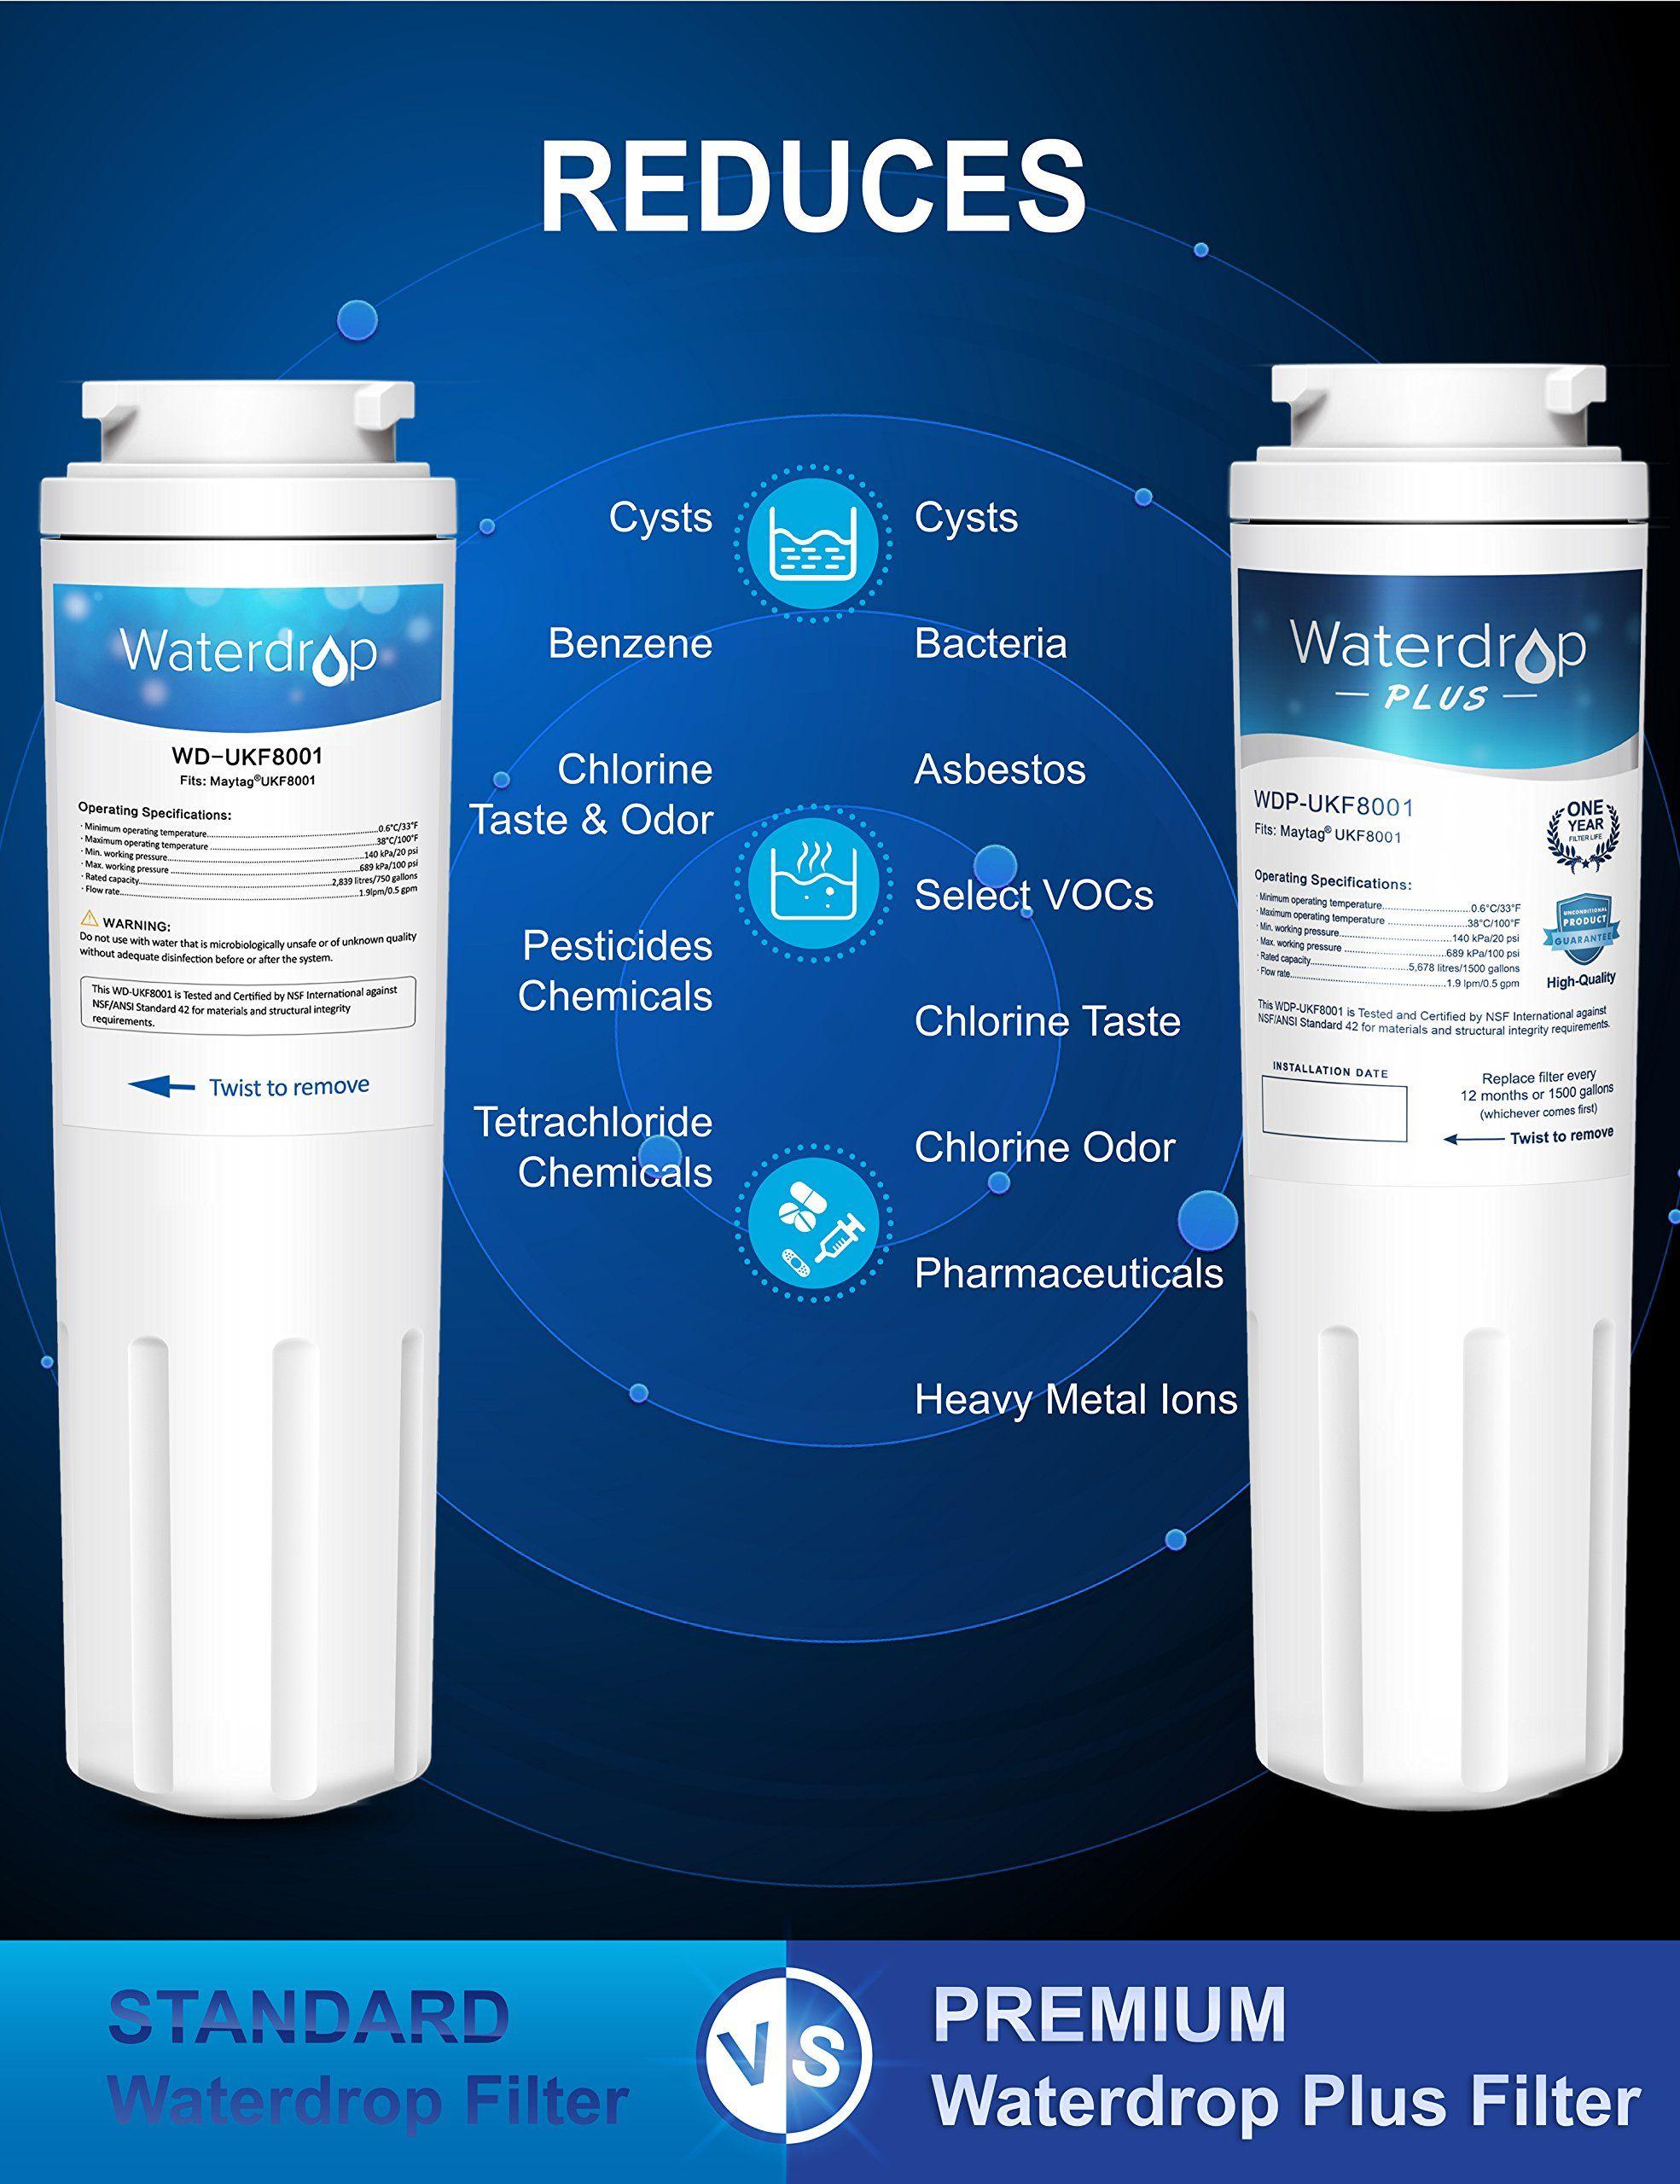 Waterdrop Plus UKF8001 Double Lifetime Refrigerator Water